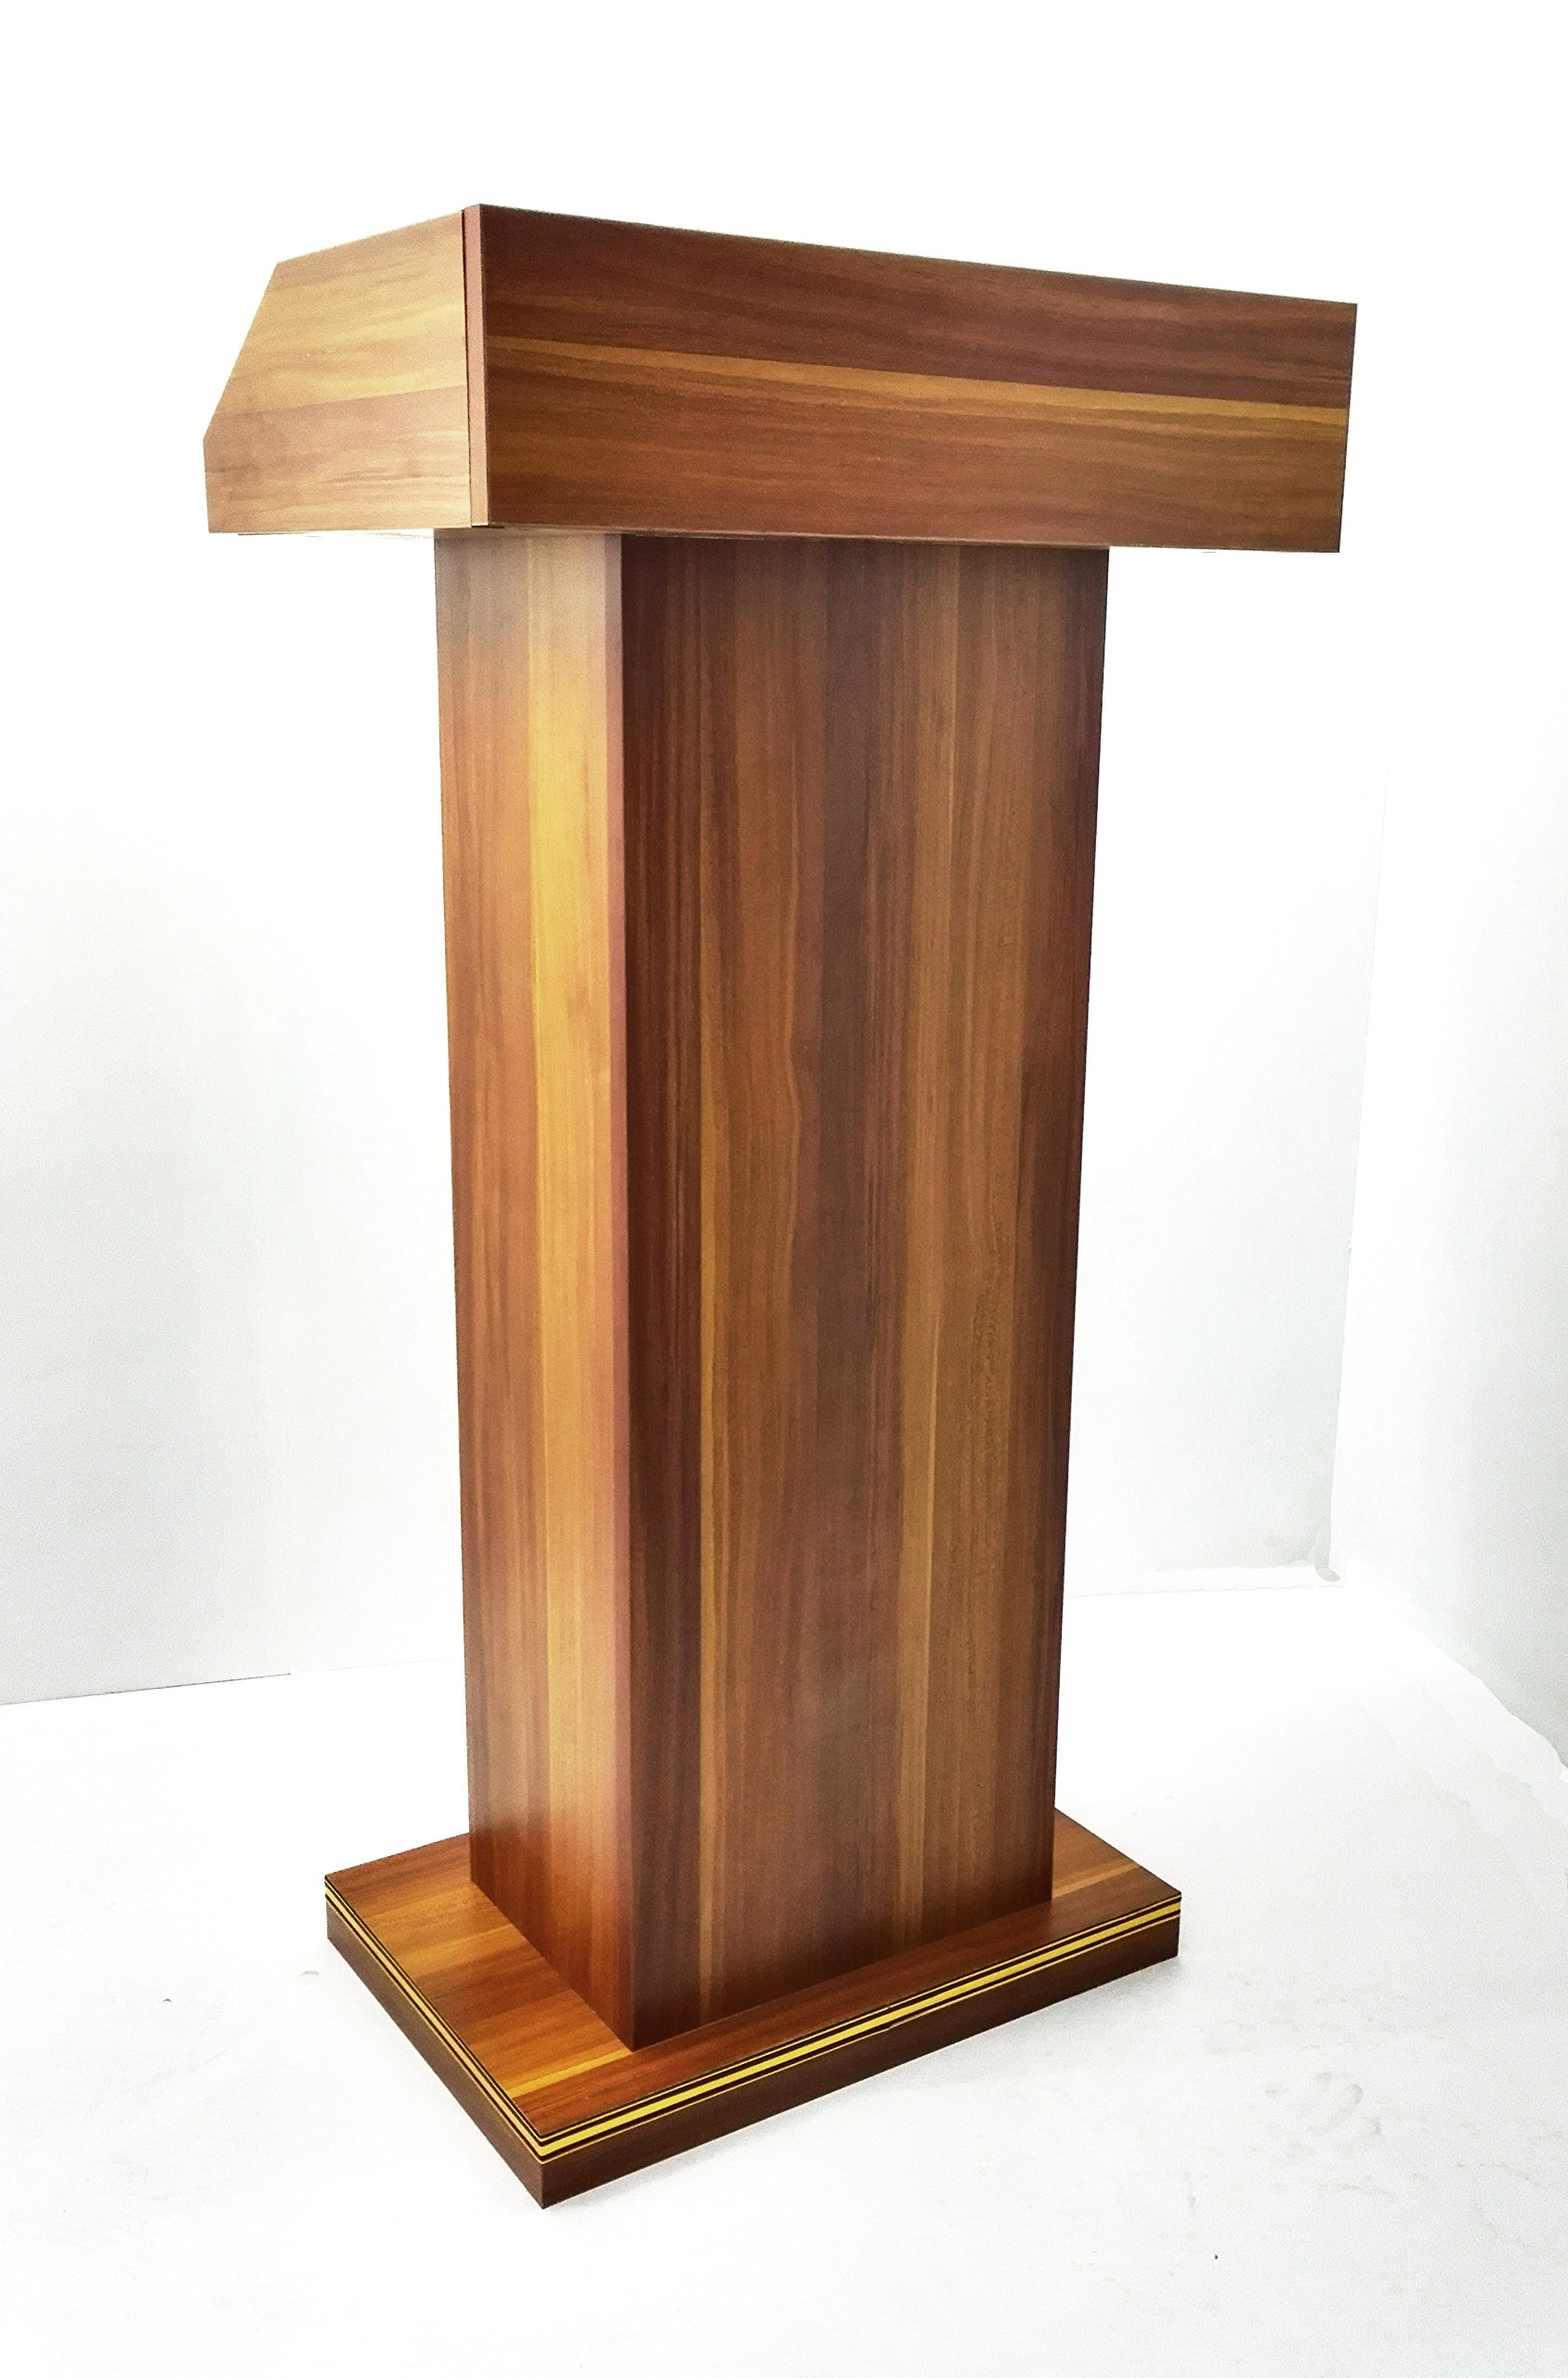 FixtureDisplays Deluxe Wood Podium Reception Restaurant Podium 11479-2